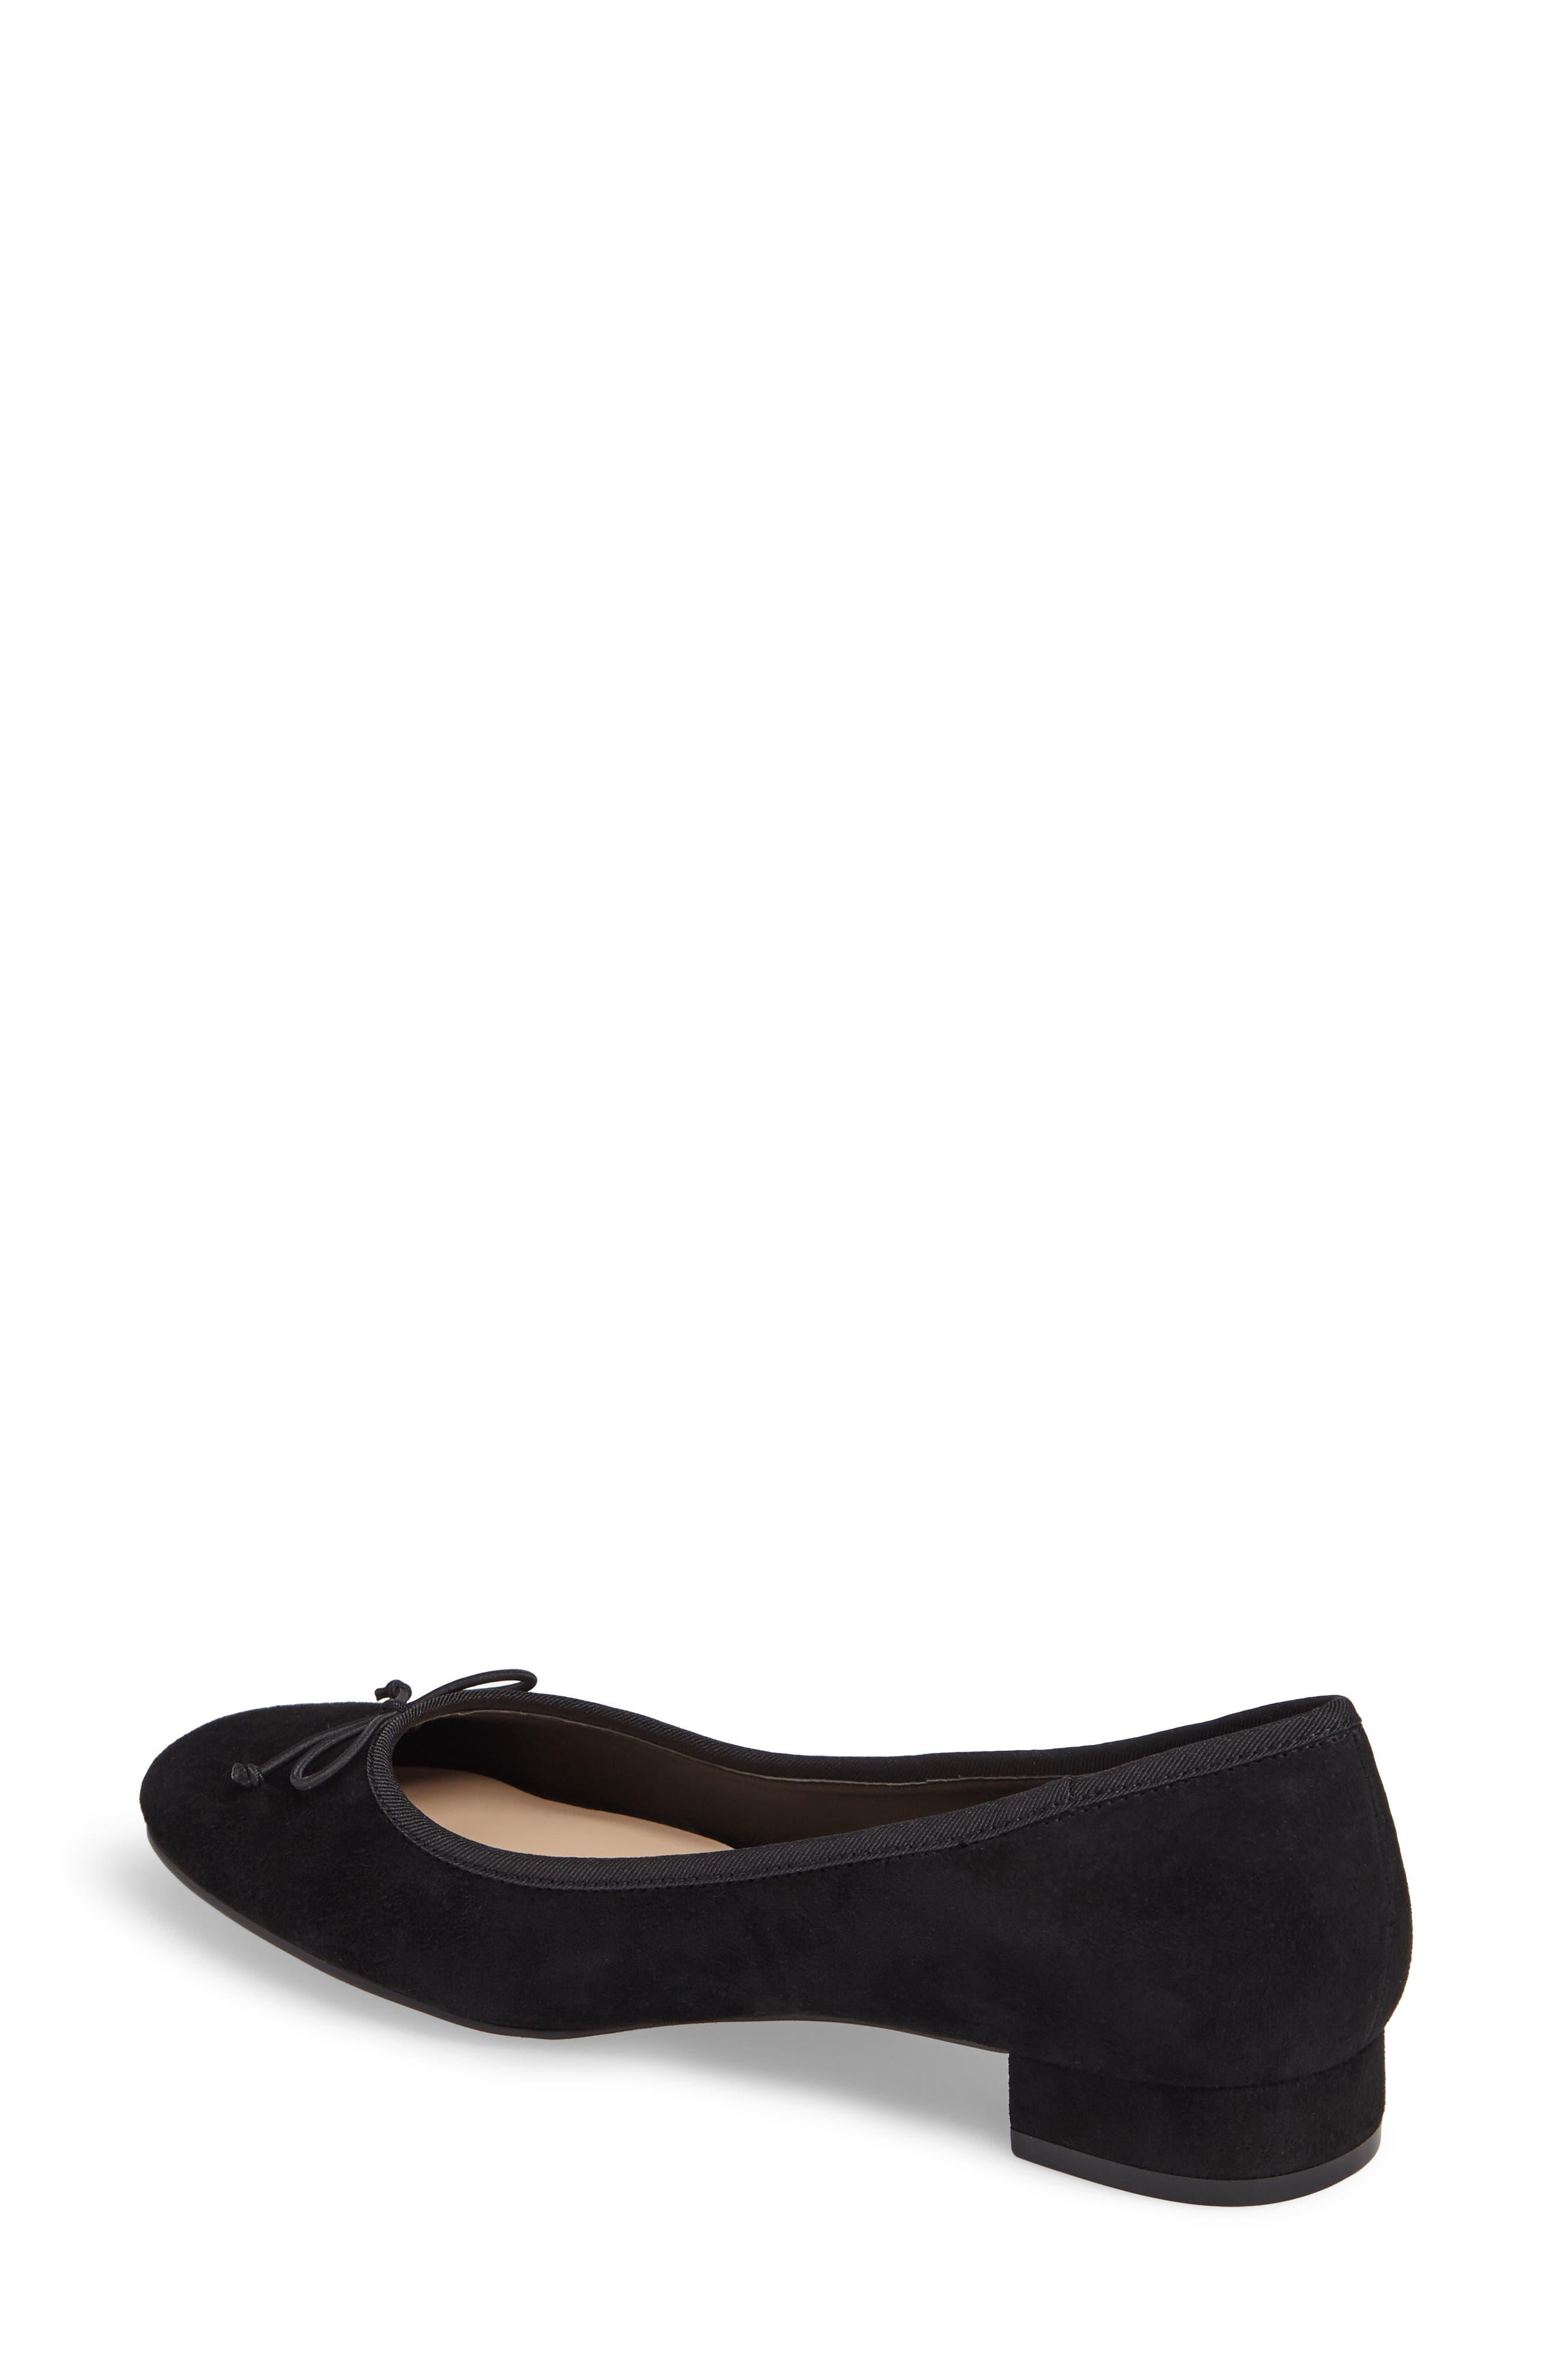 Alternate Image 2  - Sole Society Anastasi Block Heel Flat (Women)